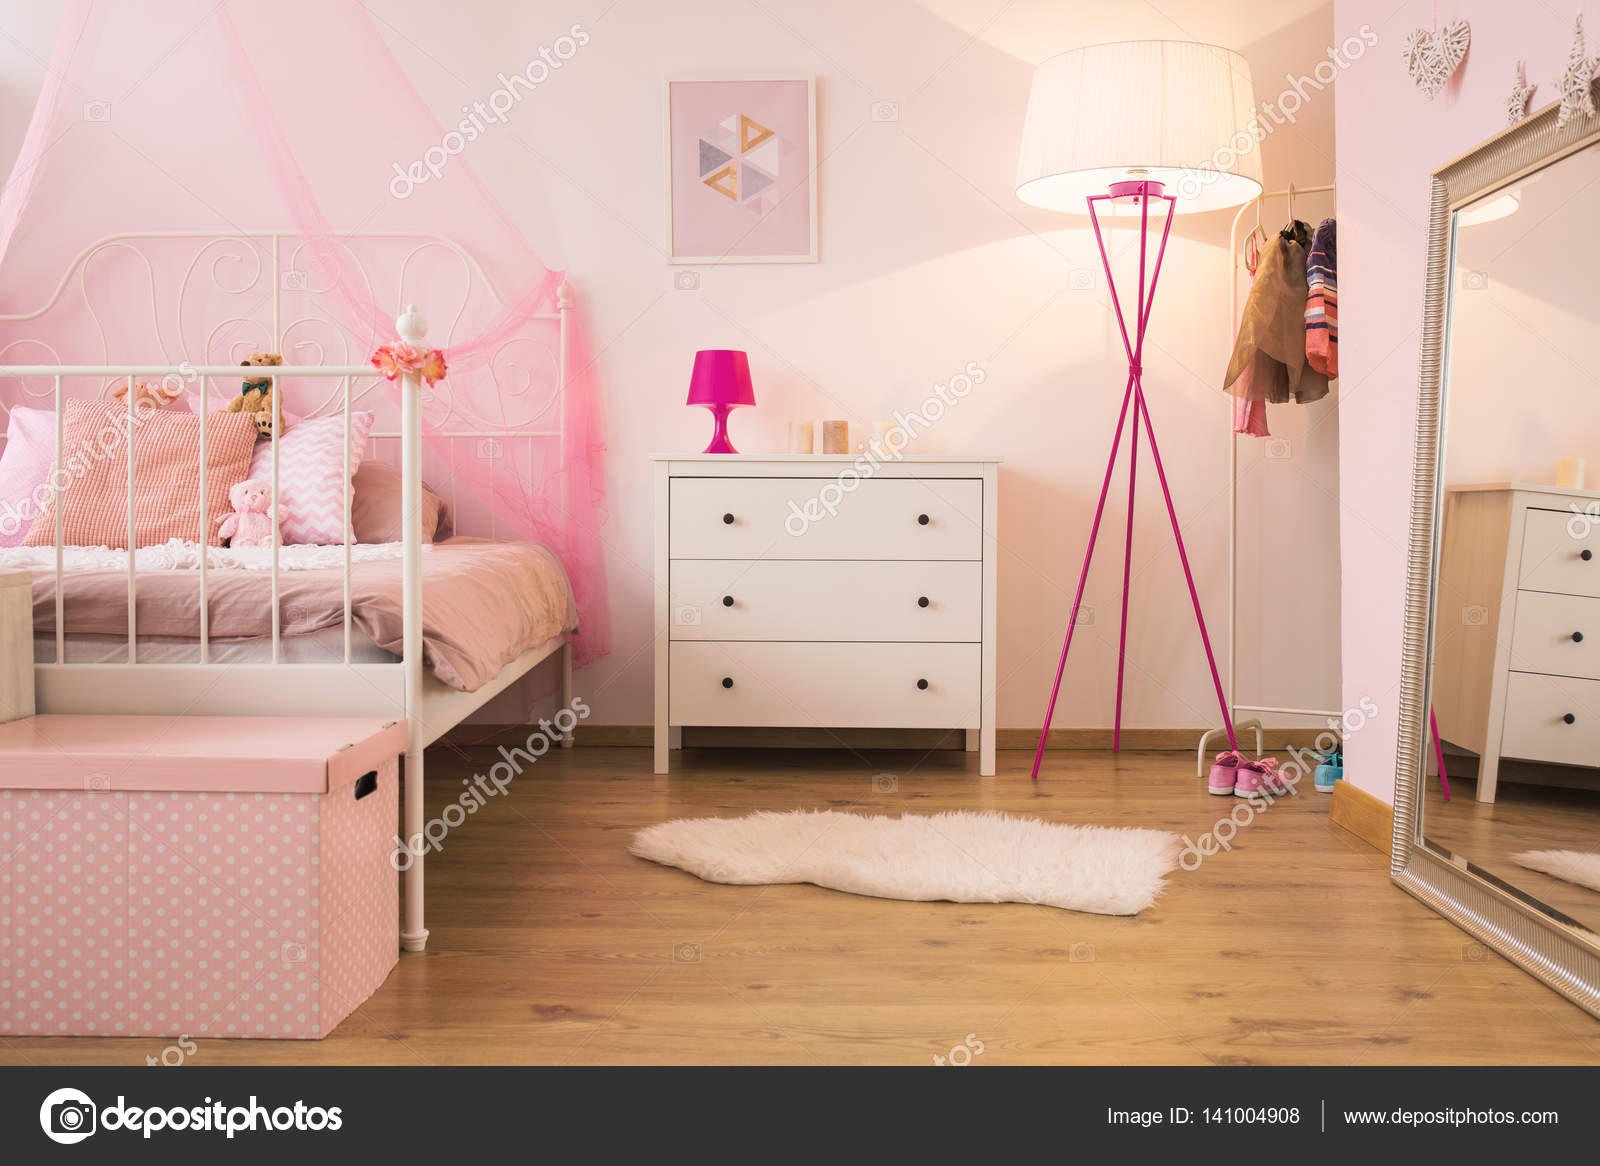 Roze Slaapkamer Lamp : Roze kind slaapkamer met lamp u stockfoto photographee eu